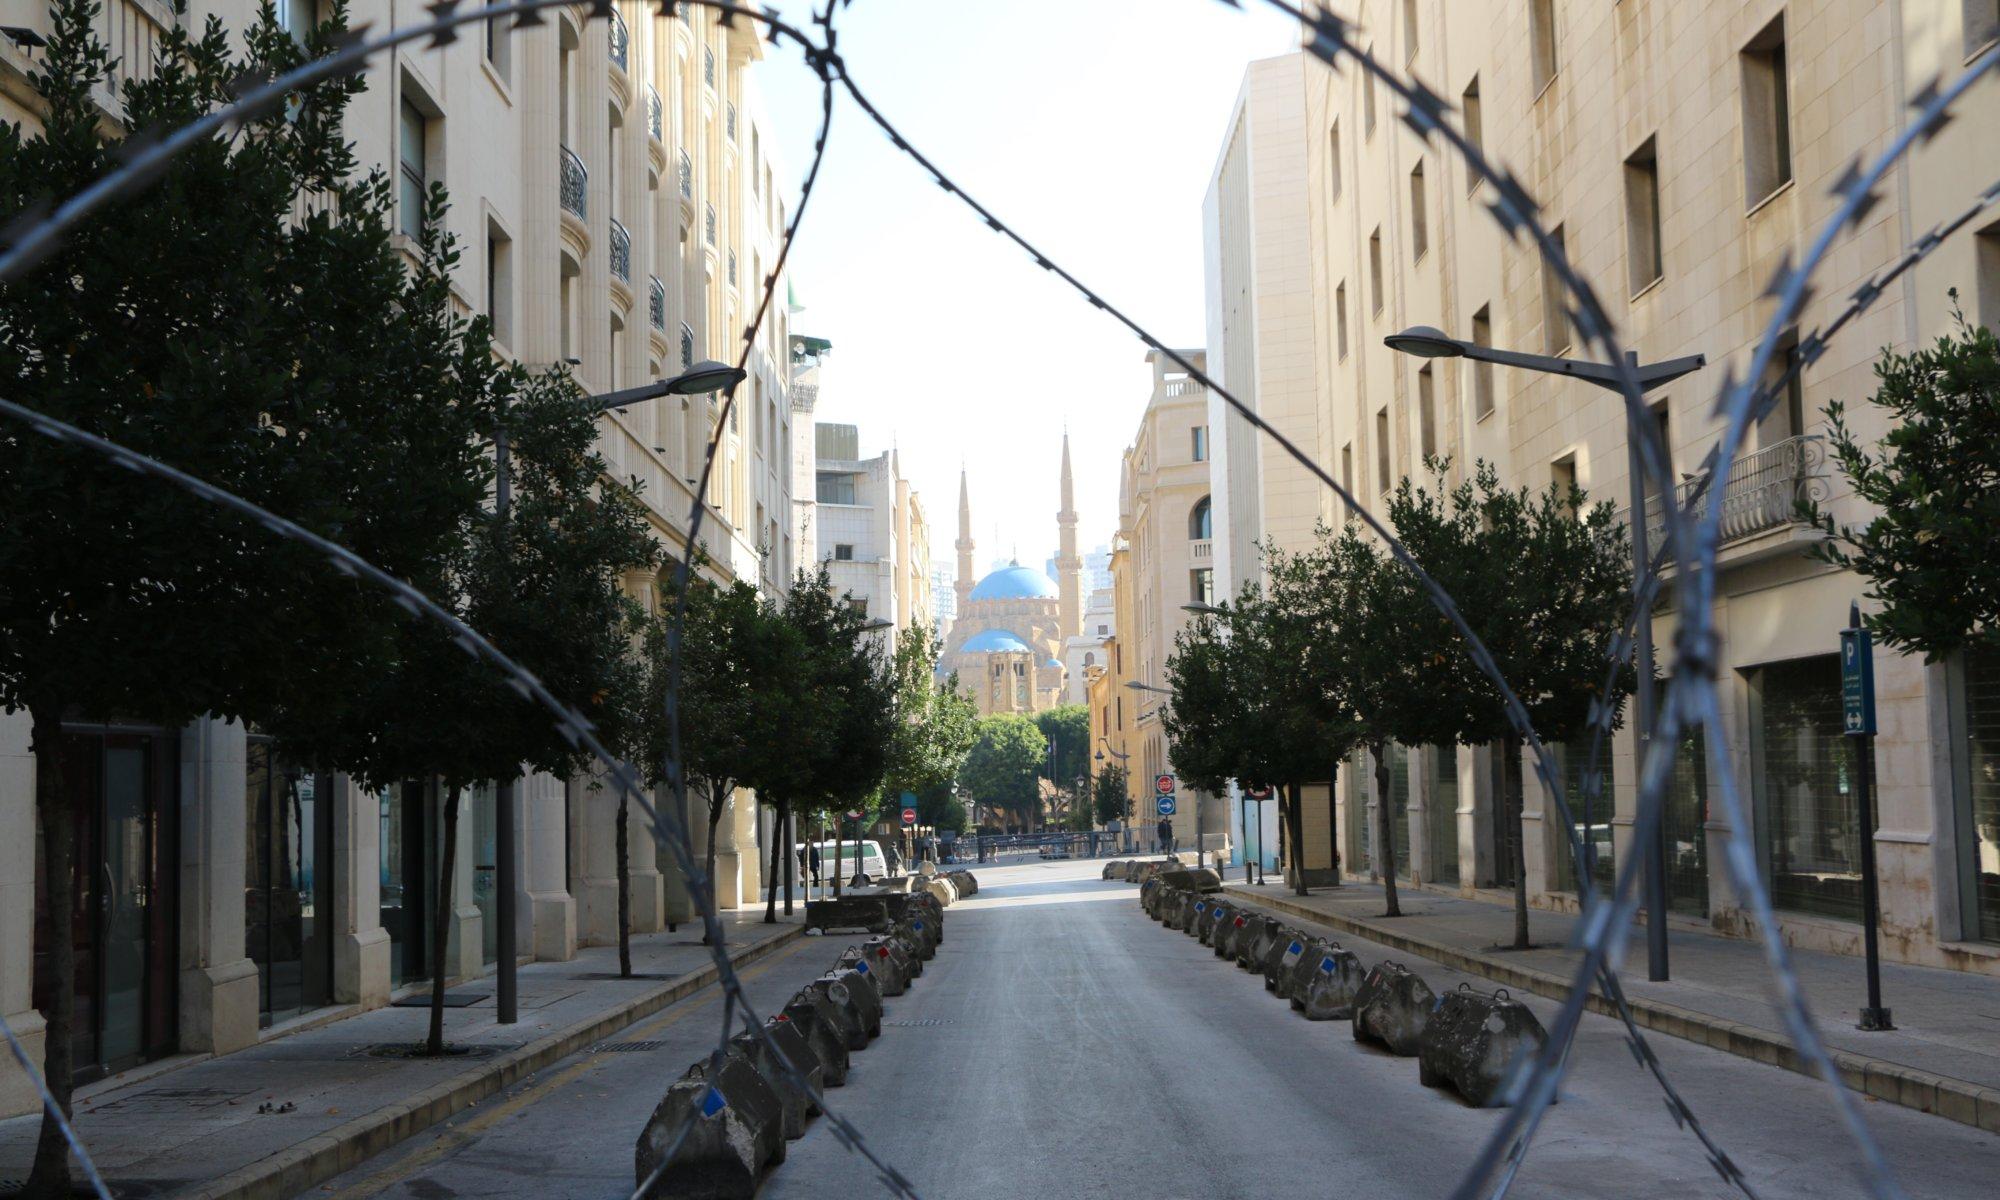 Barb wire, بيروت